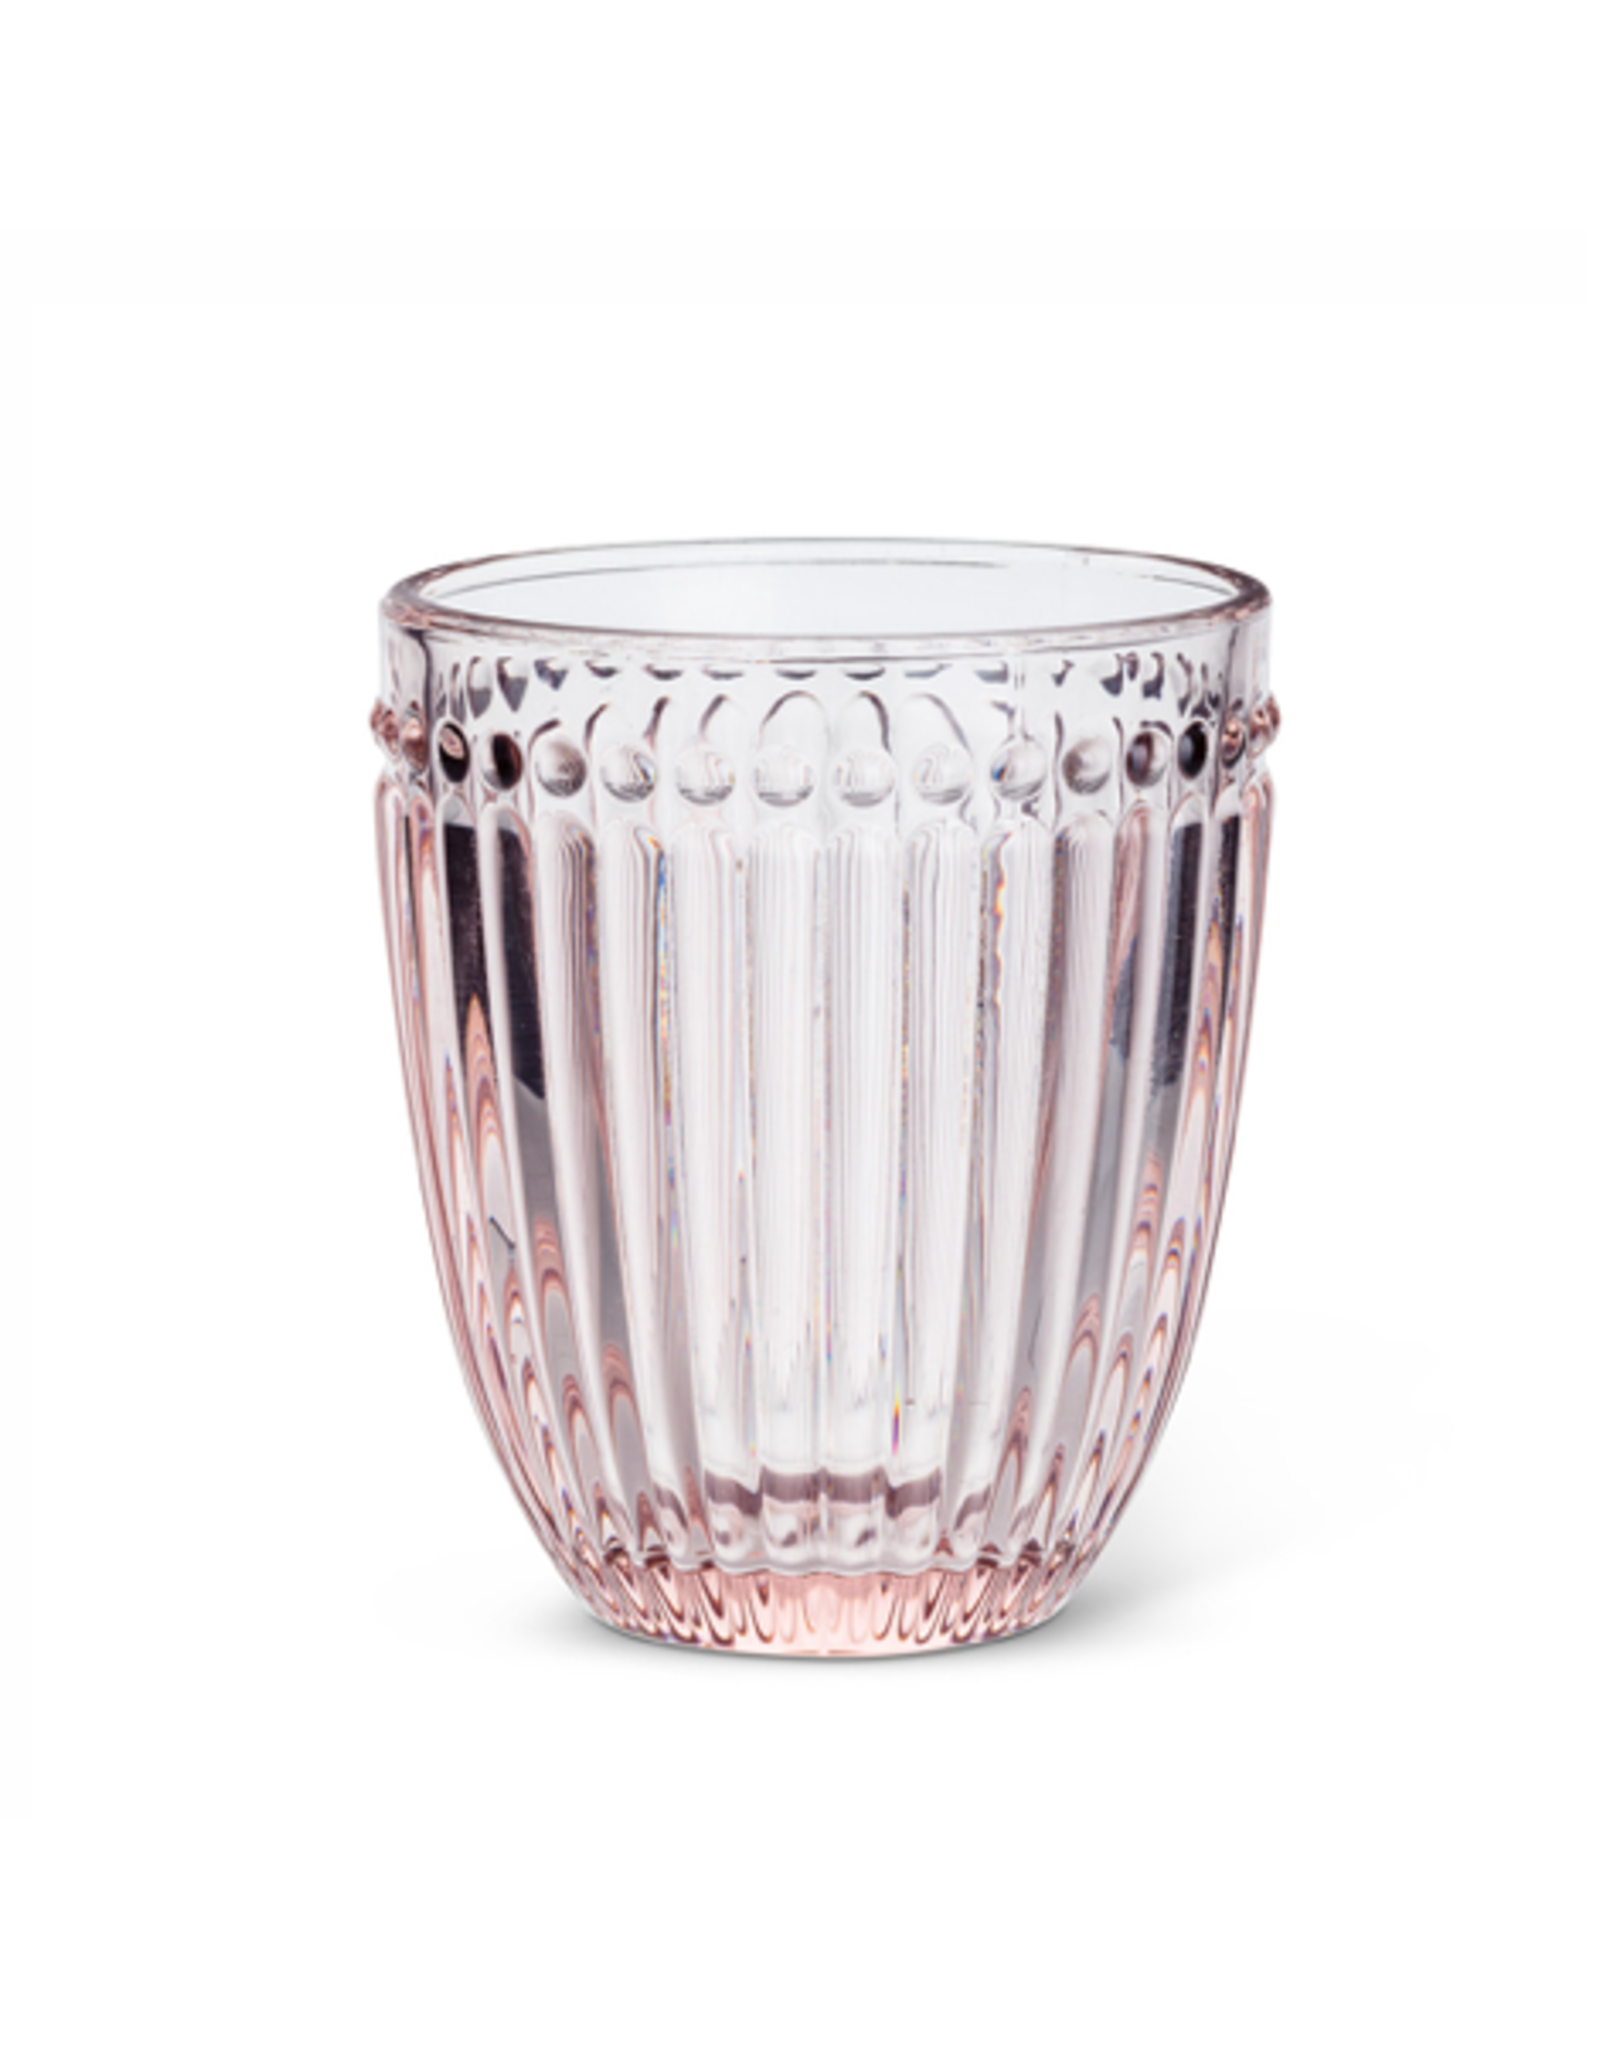 ATT - Tumbler/Dot, Pink Glass, 10oz